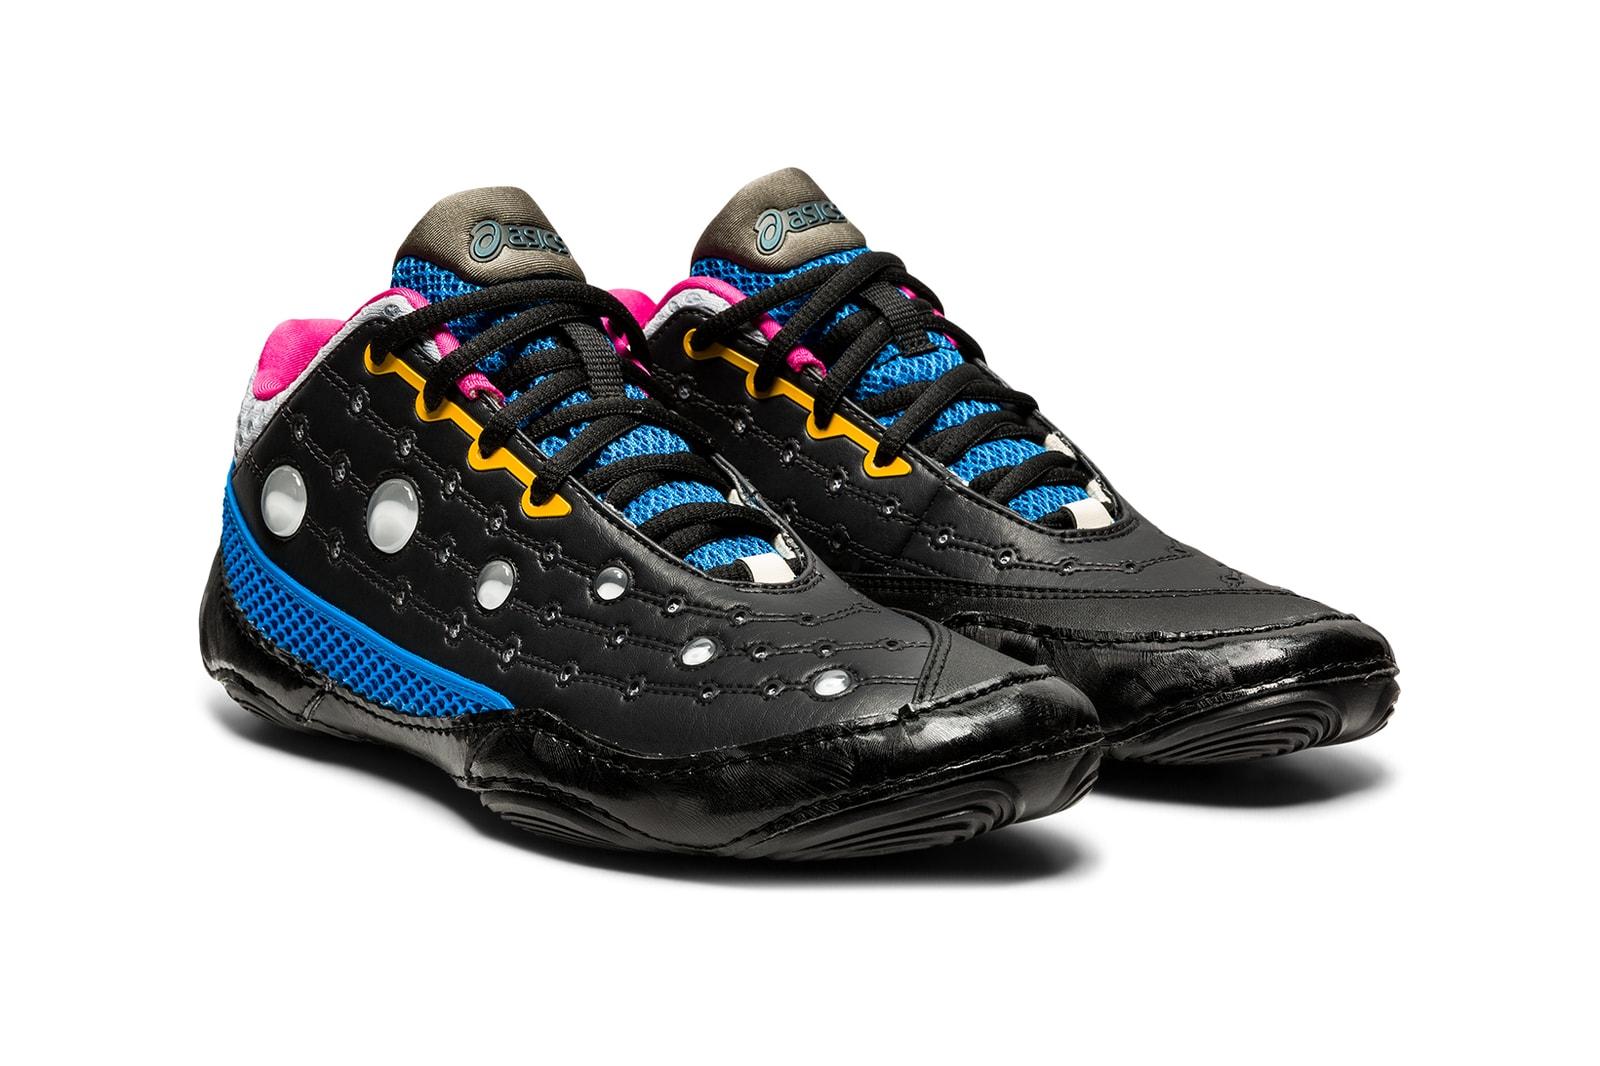 asics kiko kostadinov collaboration gessirit 2 womens sneakers black yellow green blue shoes footwear sneakerhead